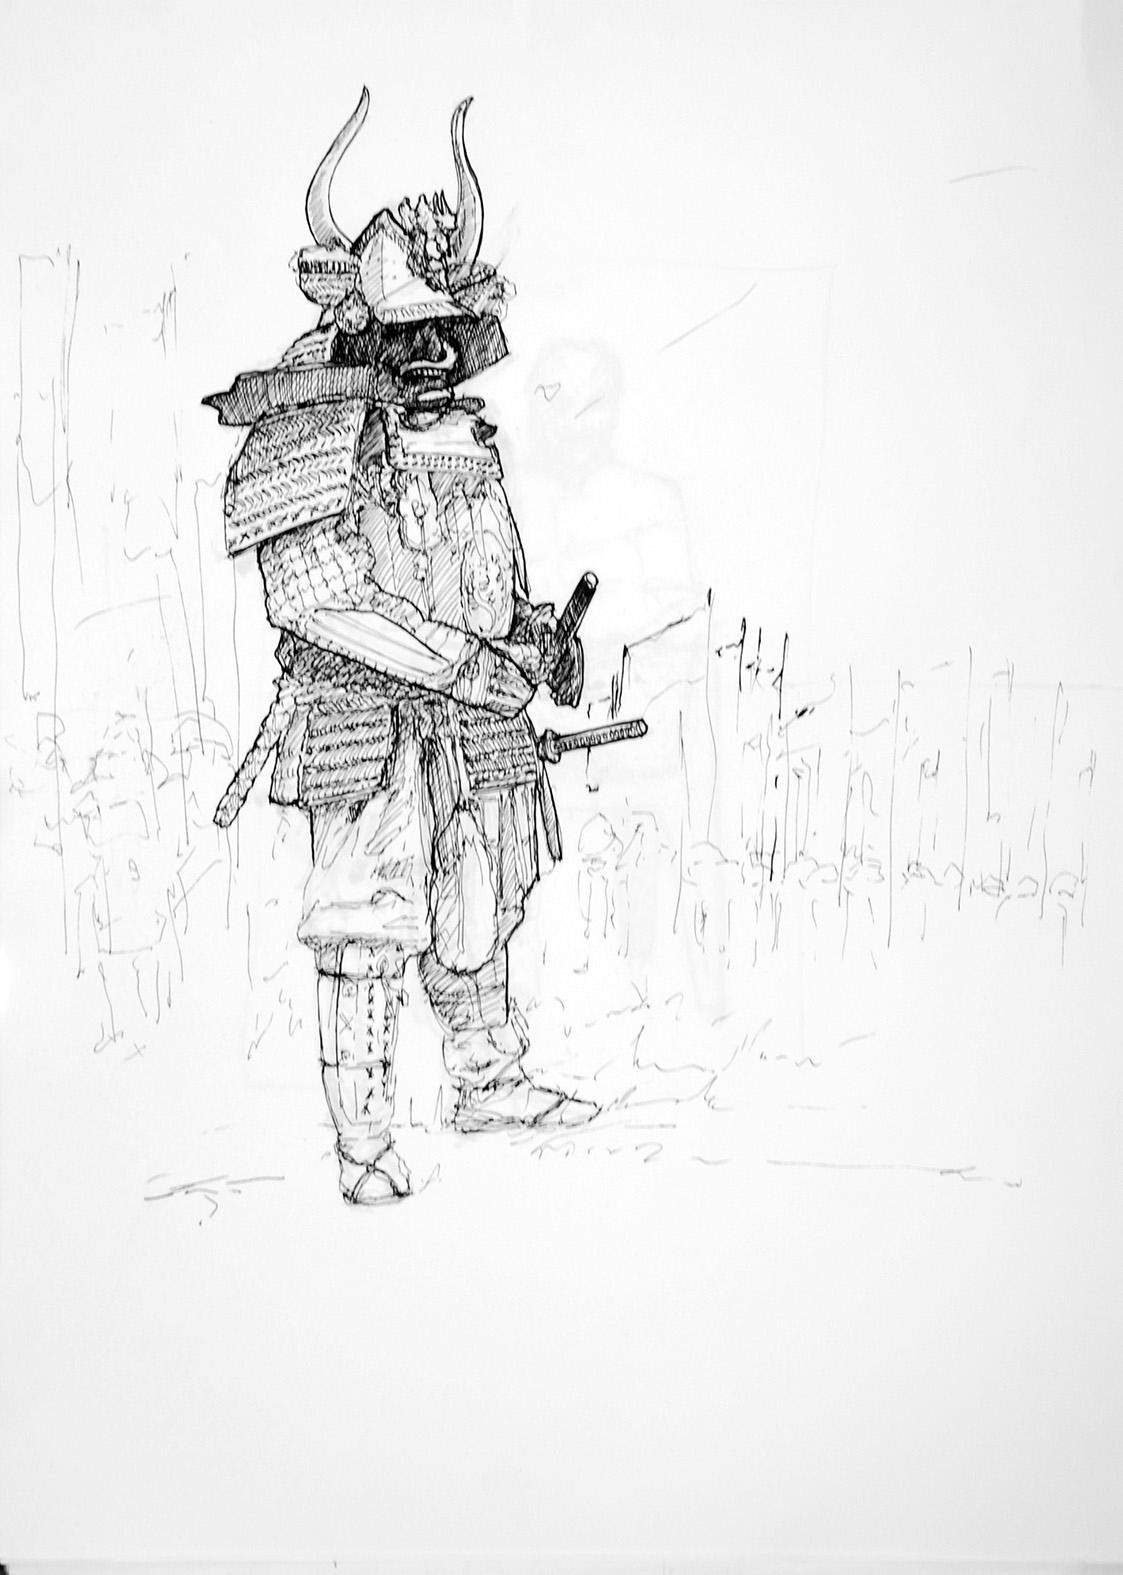 Bushi Ink paper, A3 - bushi, soldier - jandraws | ello